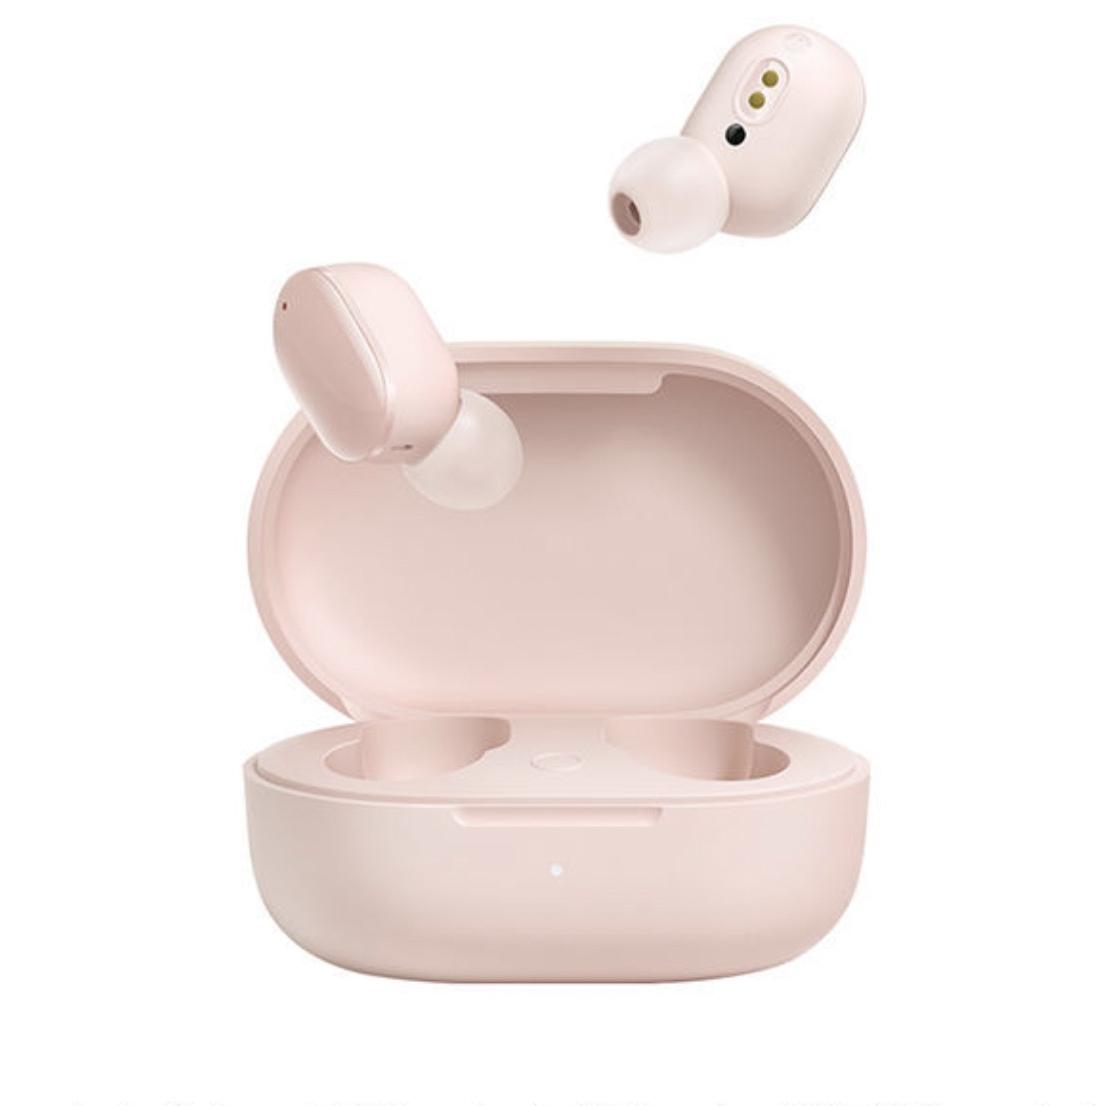 Redmi 红米 AirDots 3 入耳式真无线蓝牙耳机